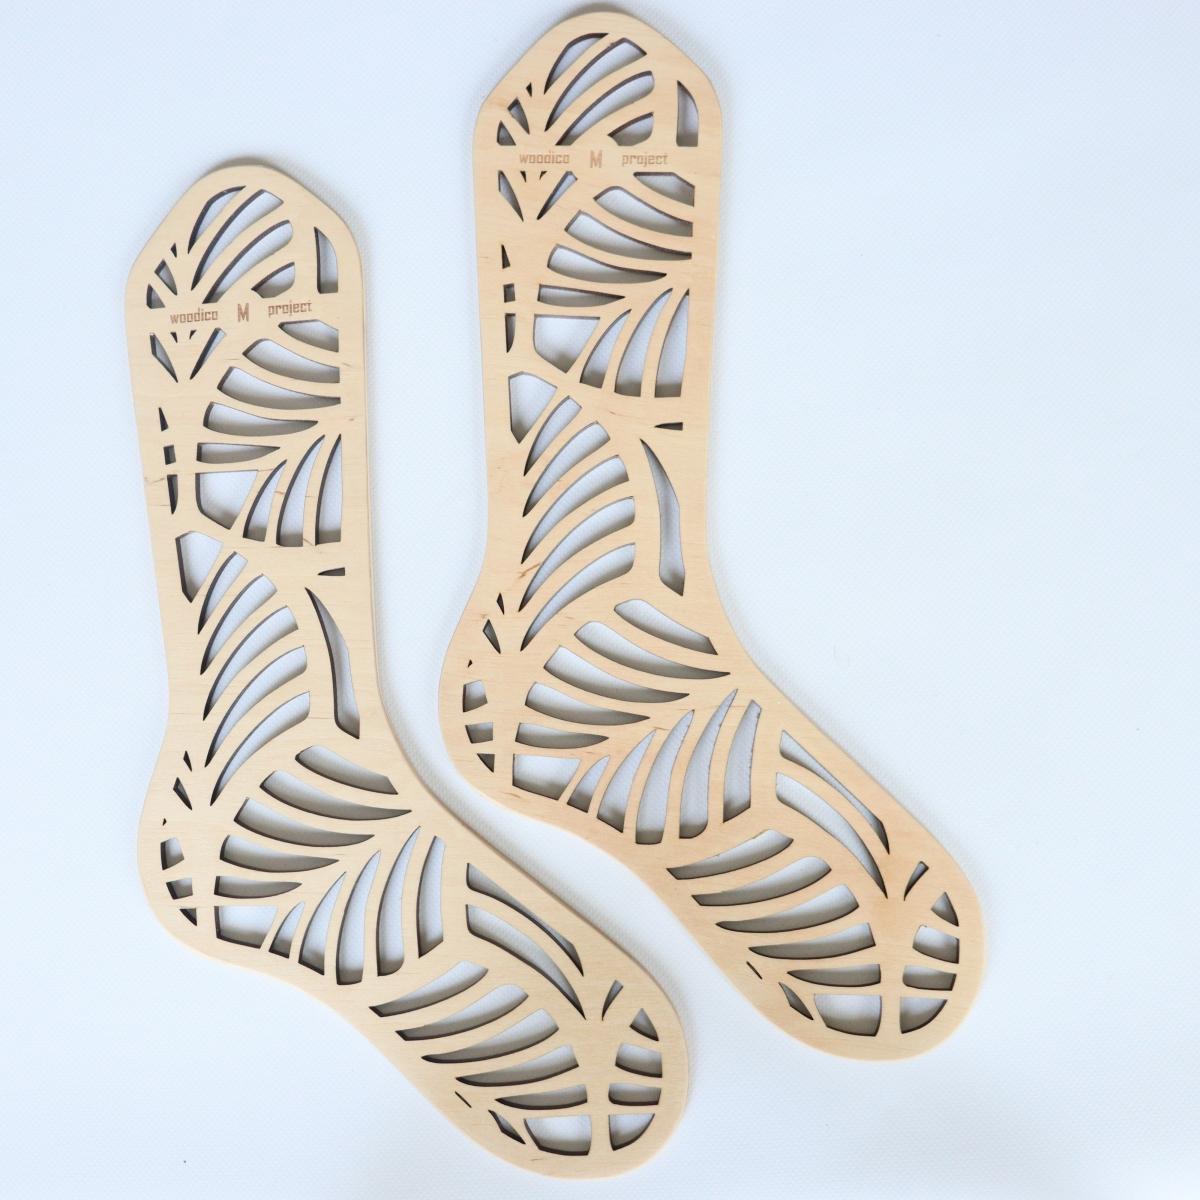 woodico.pro wooden sock blockers monstera 1 1200x1200 - Wooden sock blockers / Monstera